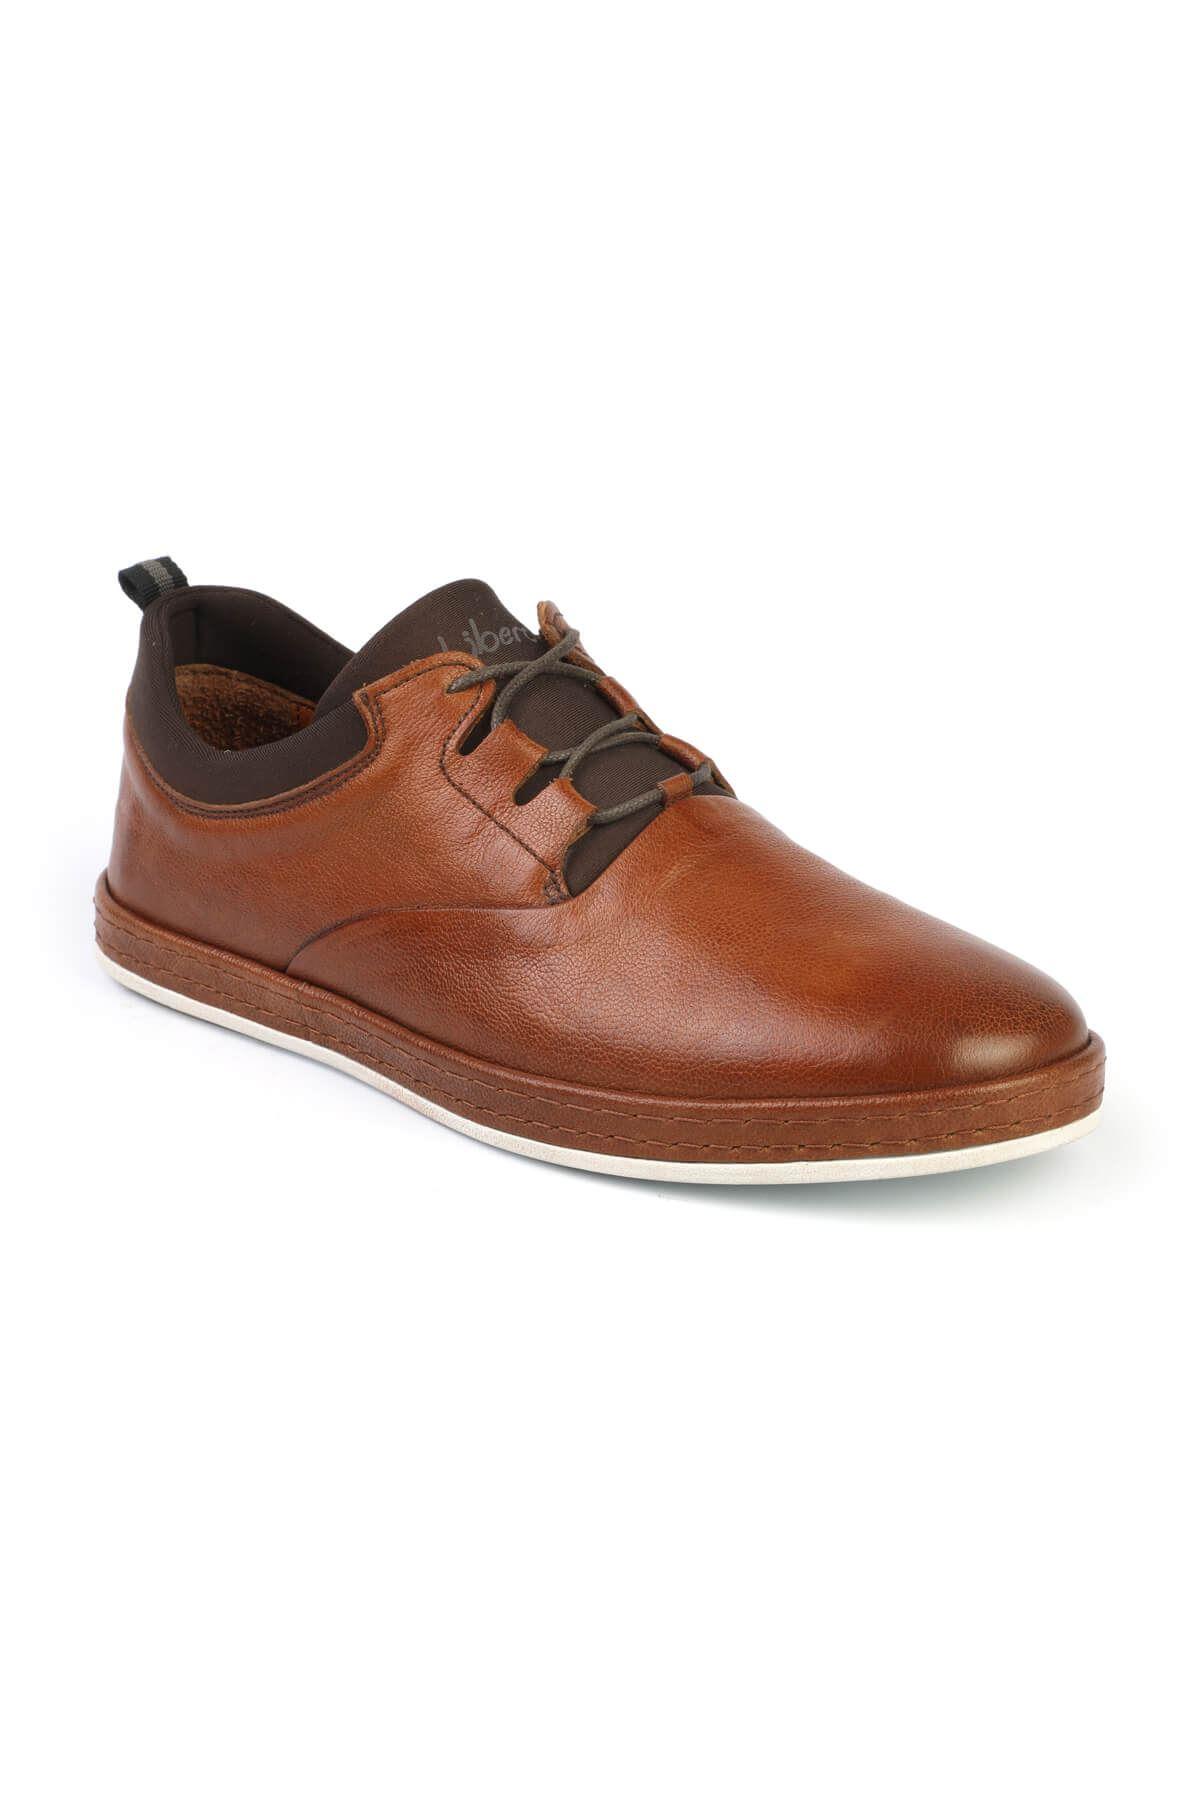 Libero 2979 Tan Casual Shoes